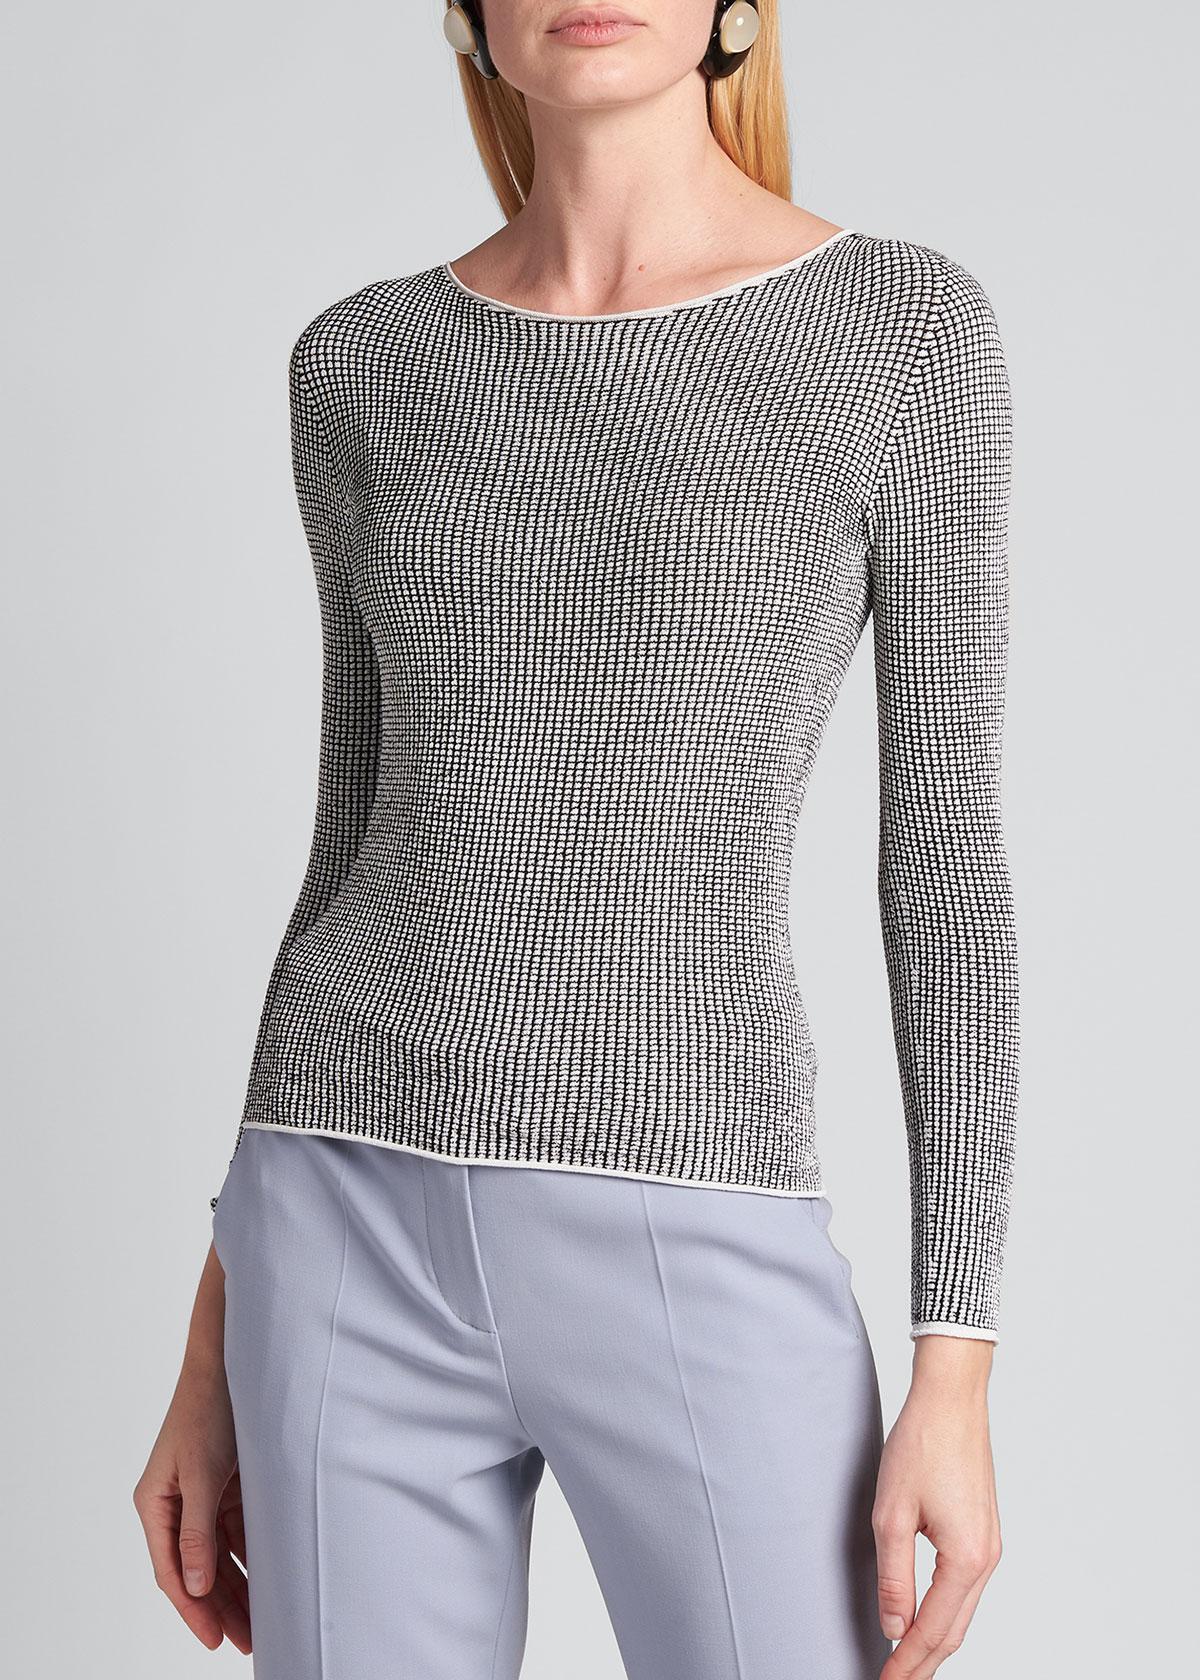 Giorgio Armani Sweaters MINI CHECK RIB KNIT BATEAU-NECK SWEATER